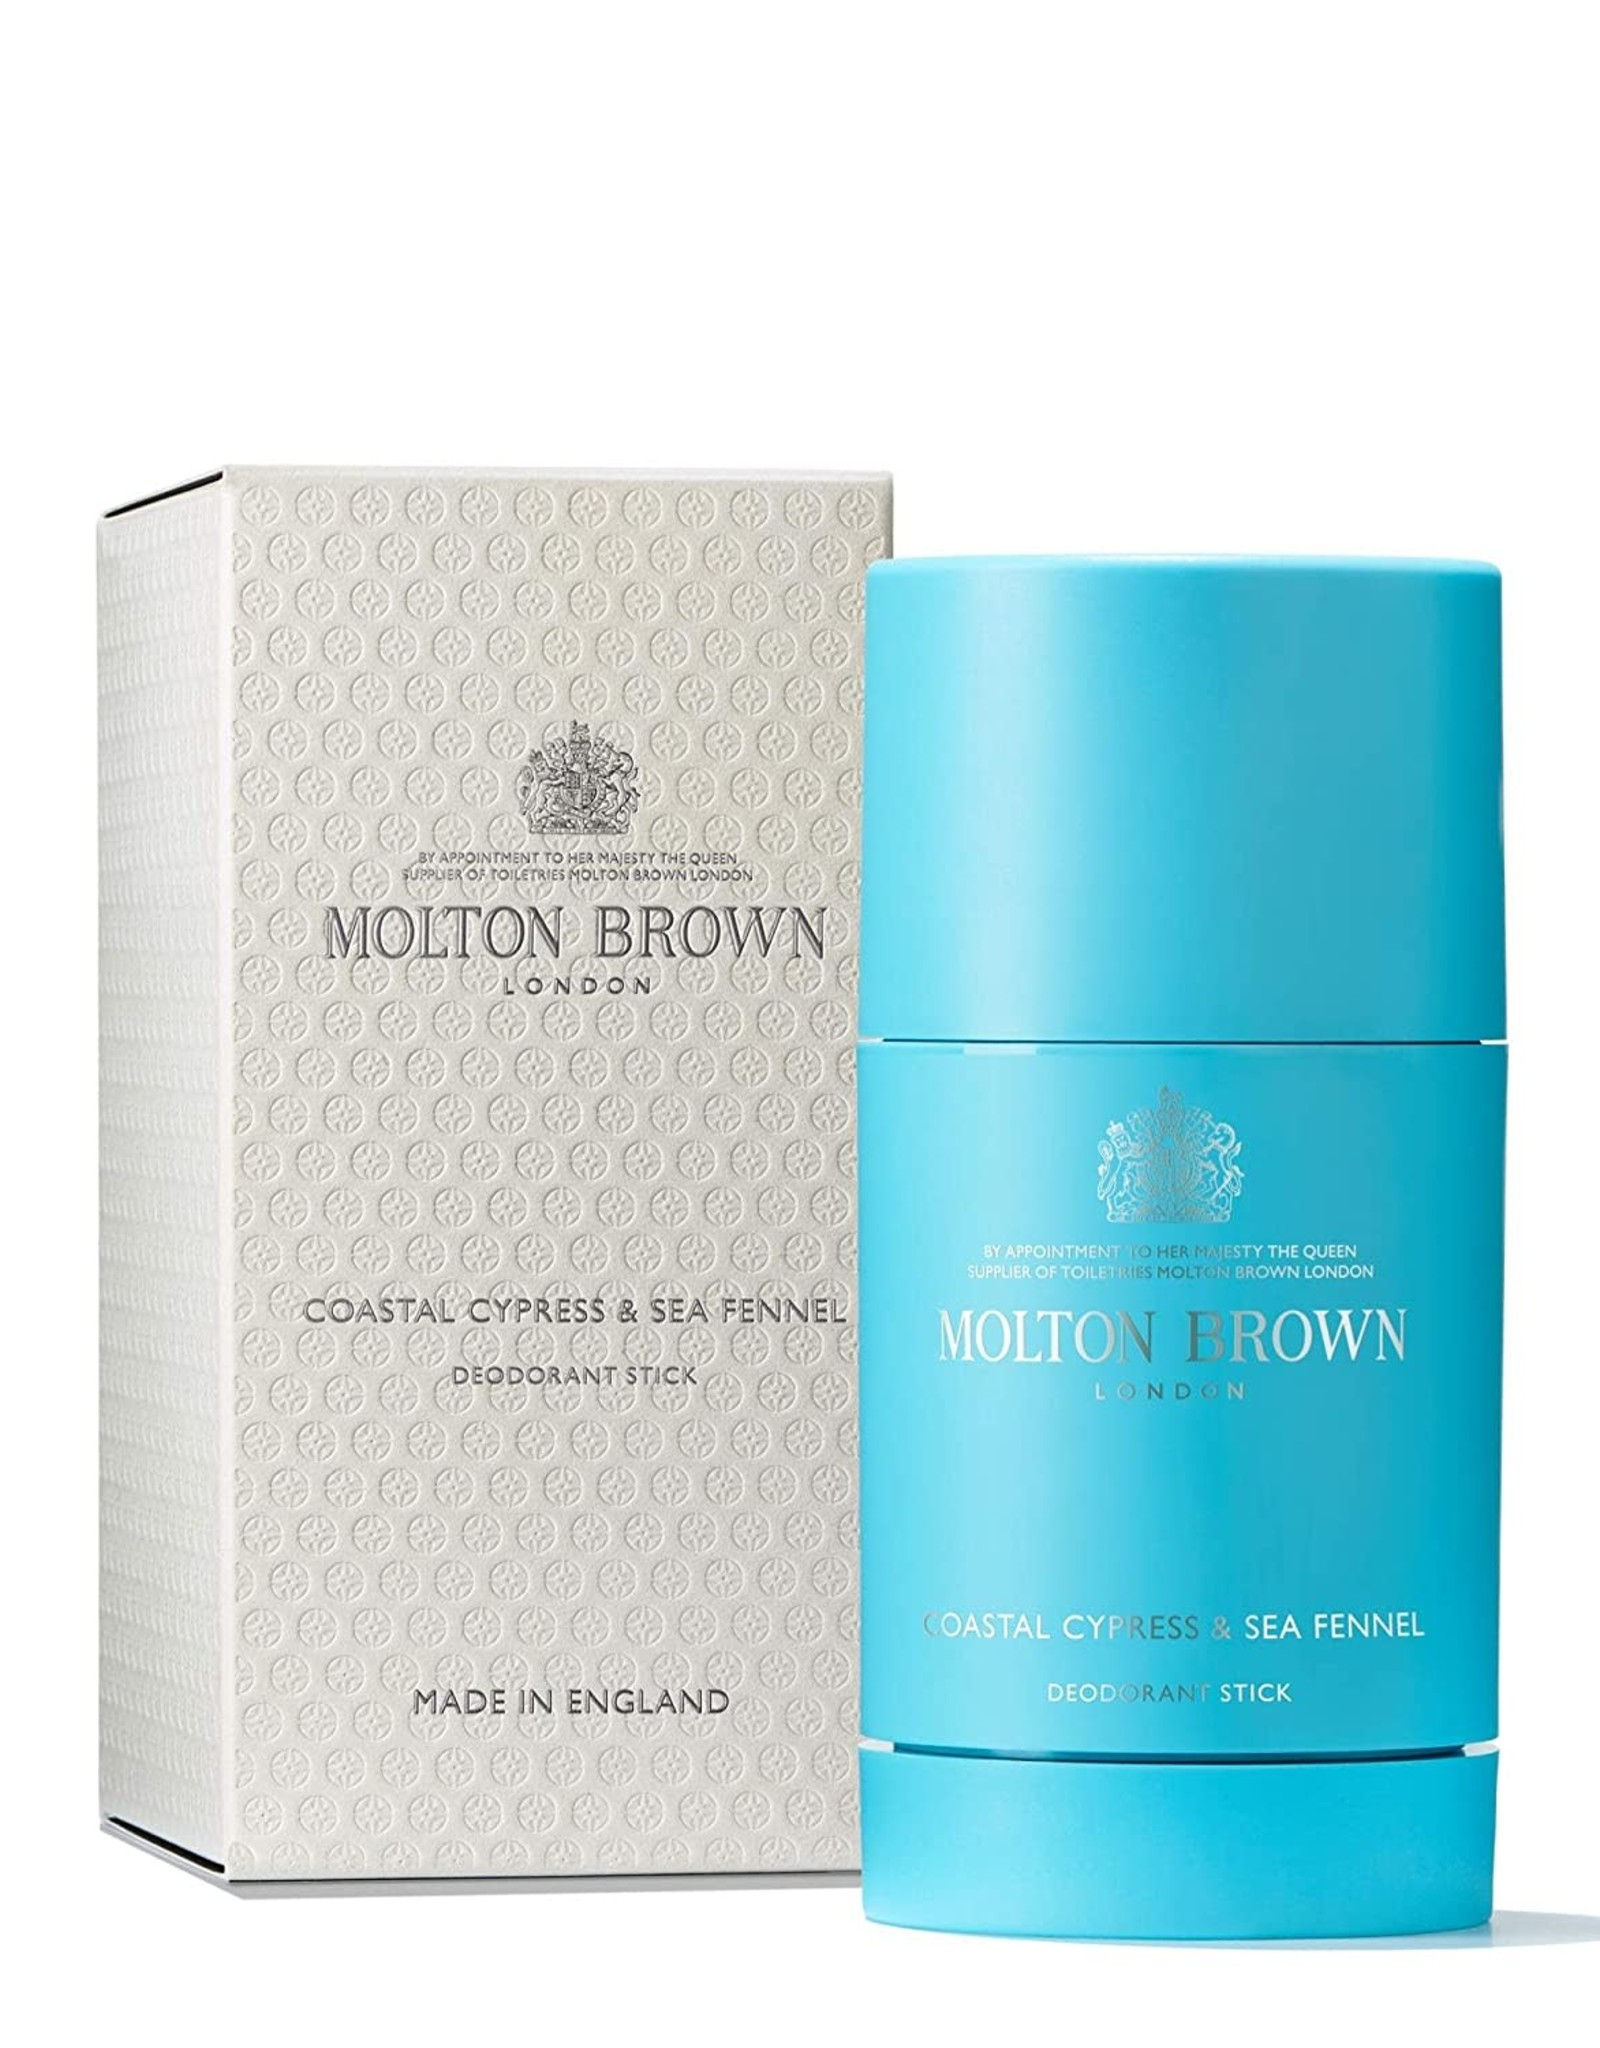 Molton Brown Coastal Cypress & Sea Fennel Deodorant Stick